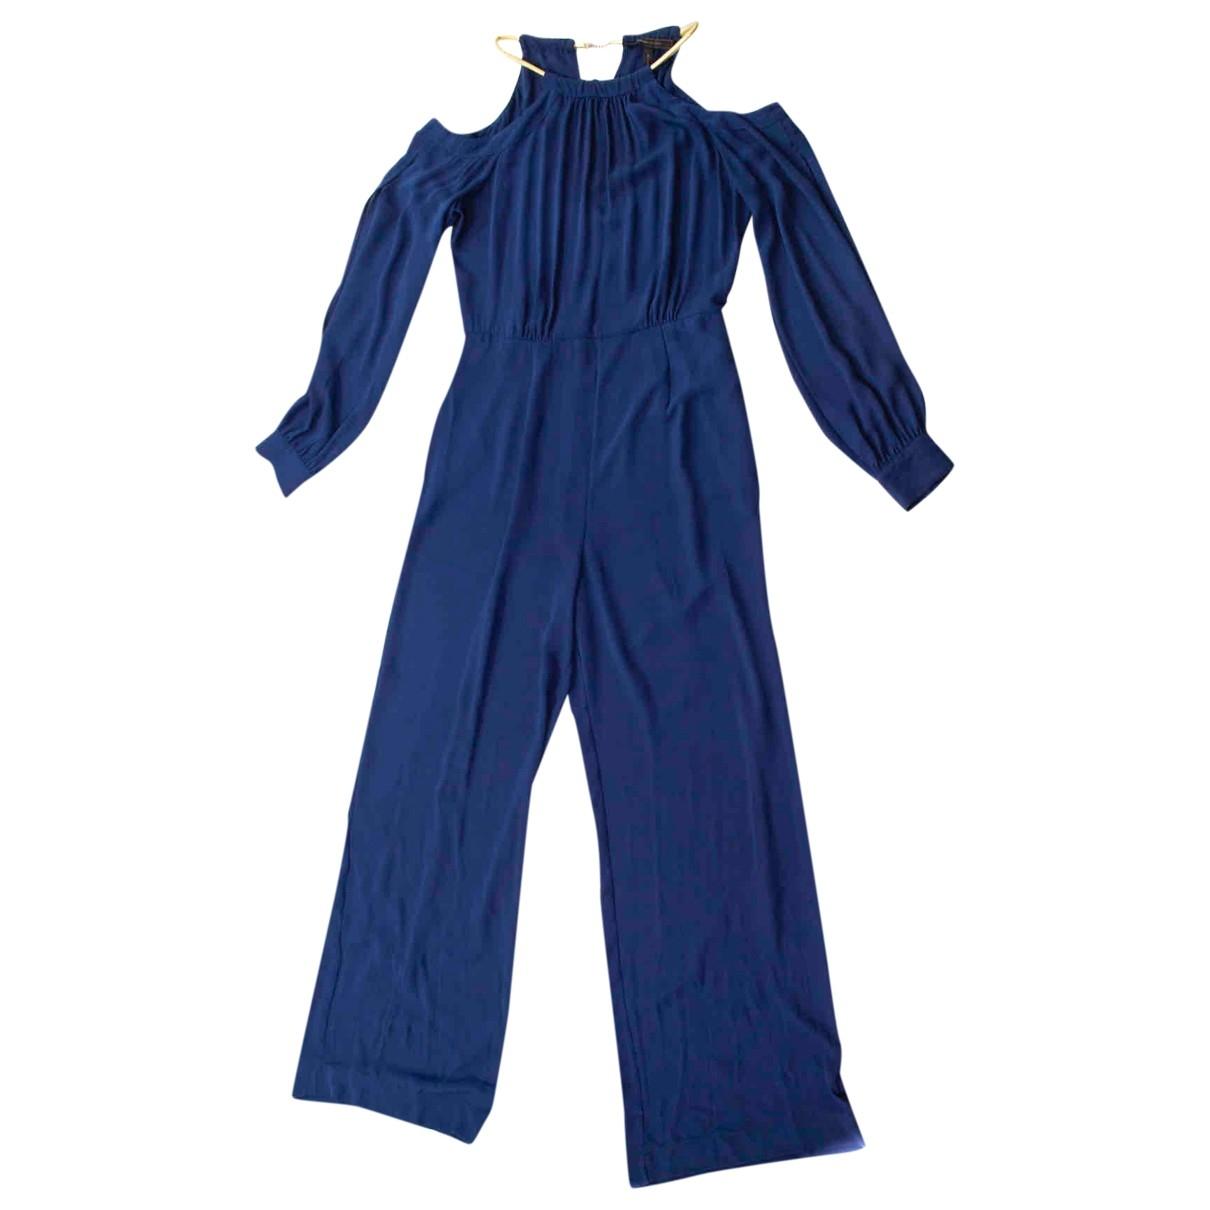 Bcbg Max Azria \N Navy jumpsuit for Women 8 US